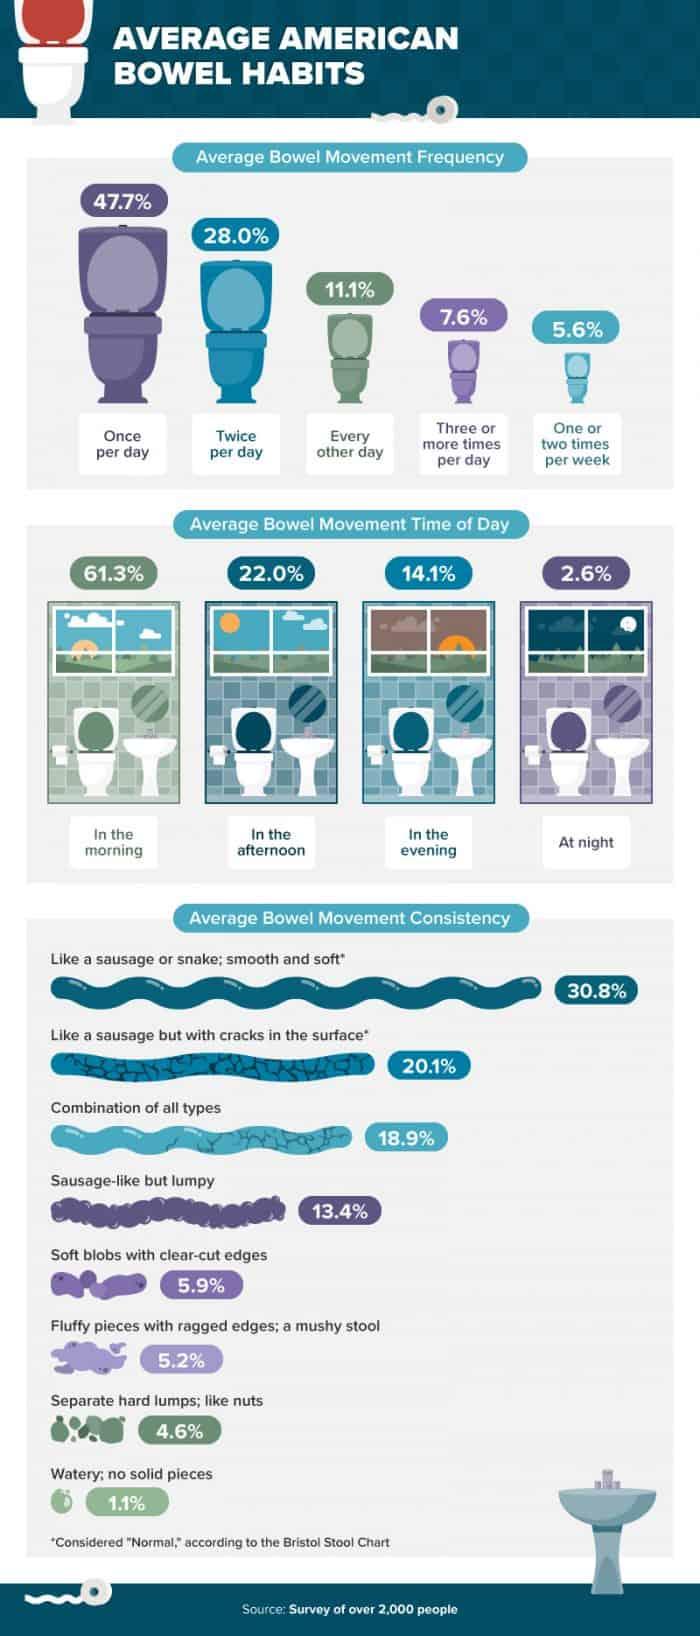 Average American Bowel Habits Infographic